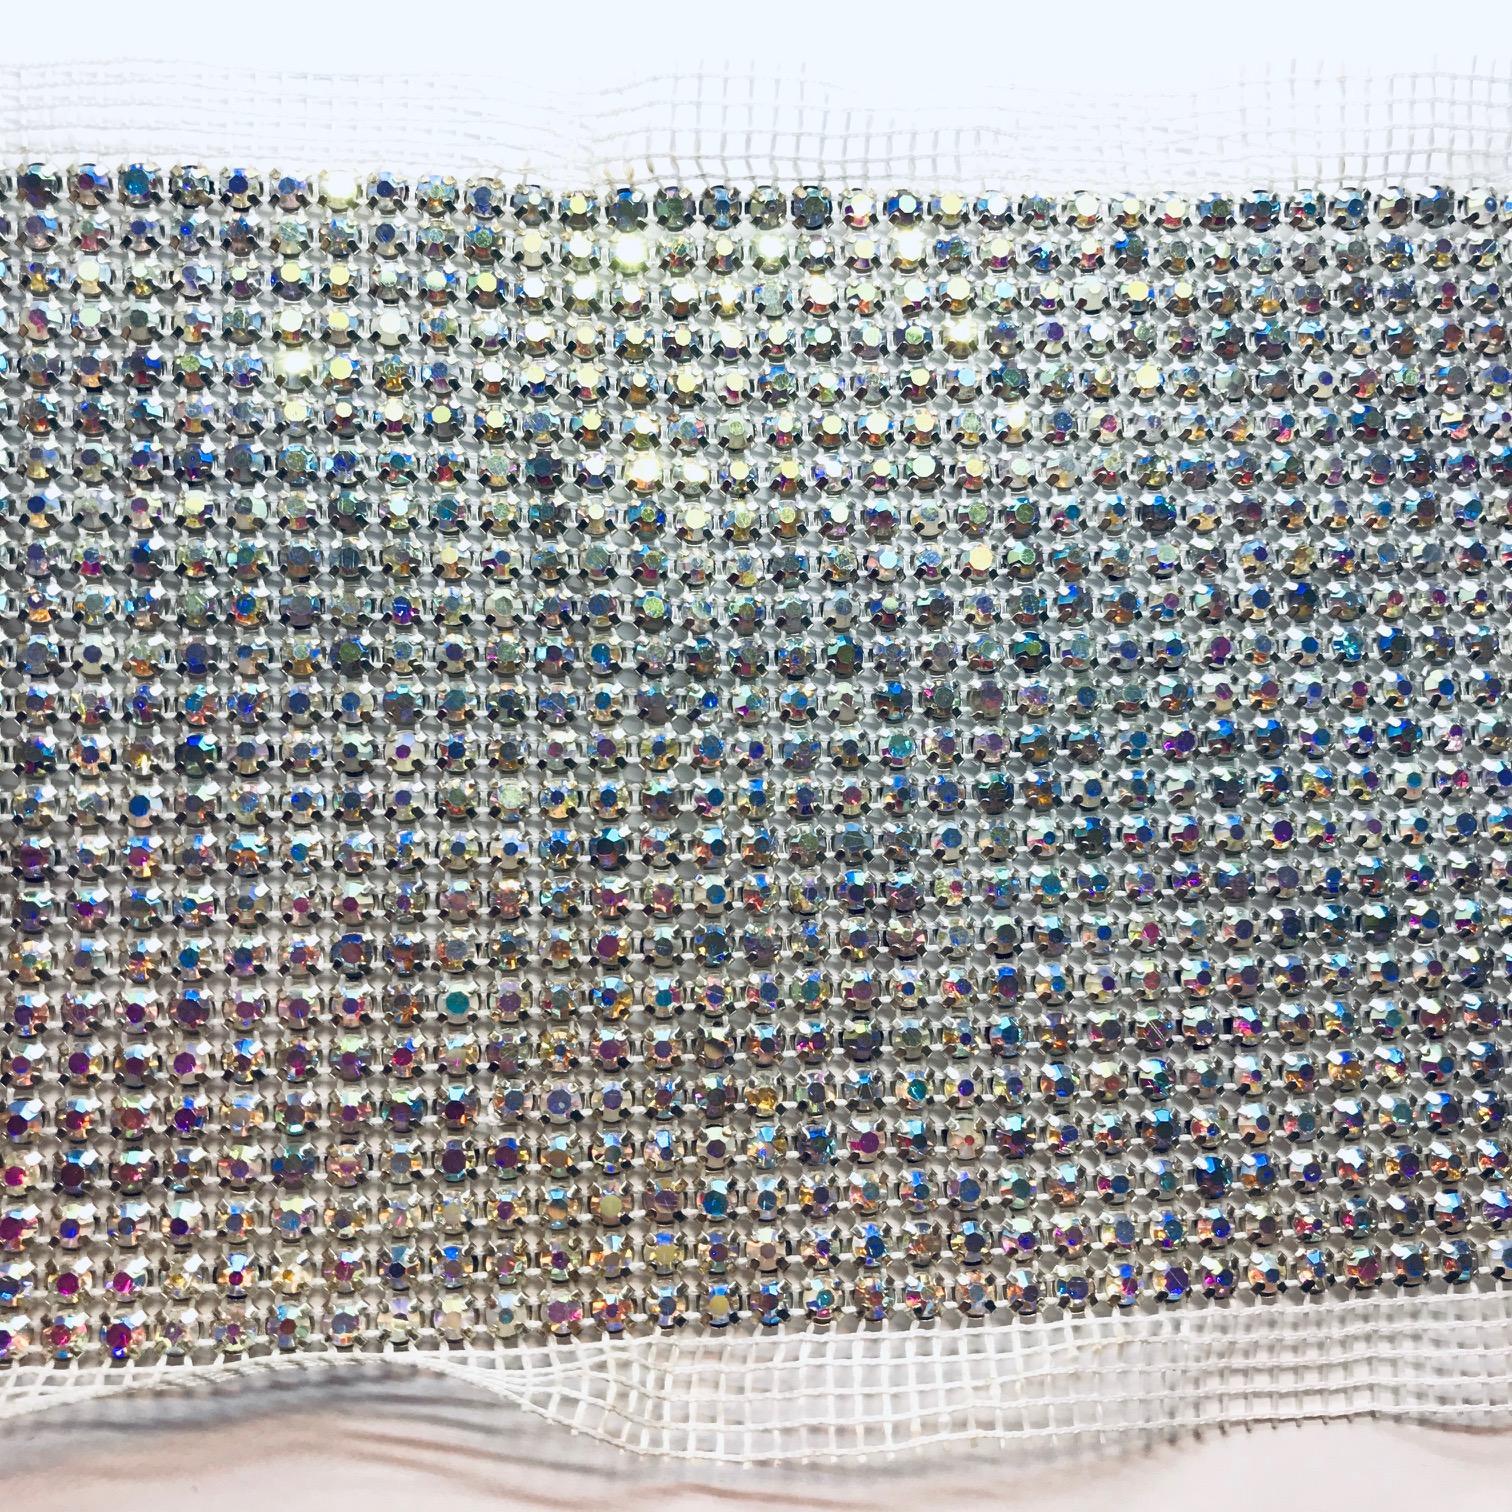 Bande de strass a coudre 3mm base metal avec elements strass cristal ab 24 rangs 1